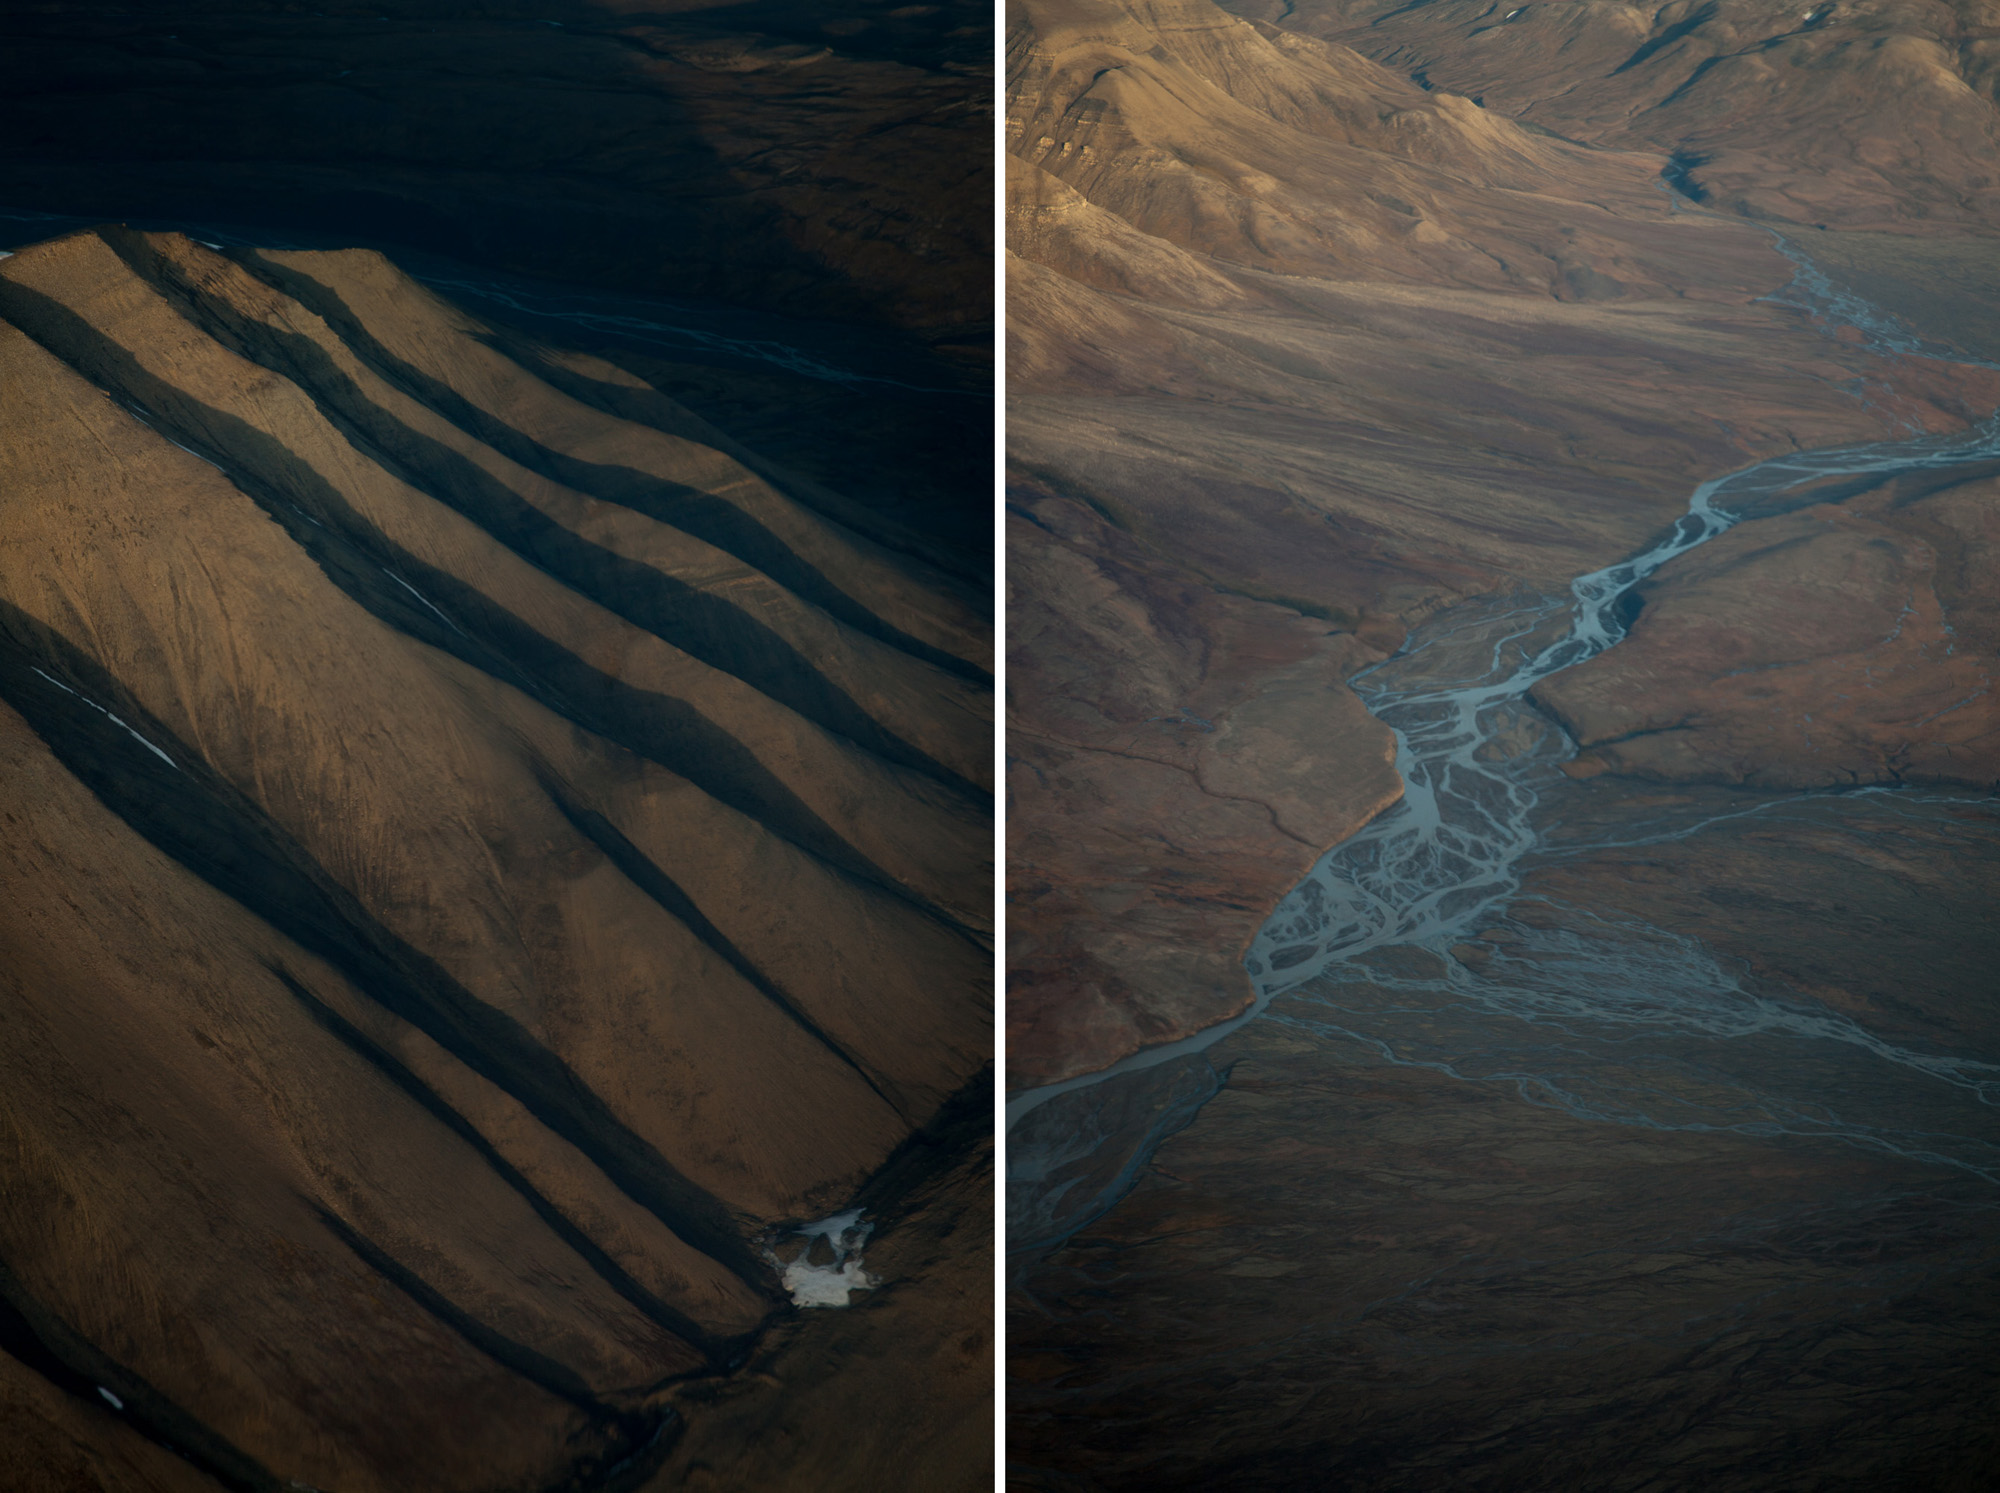 arctic-svalbard-01.jpg